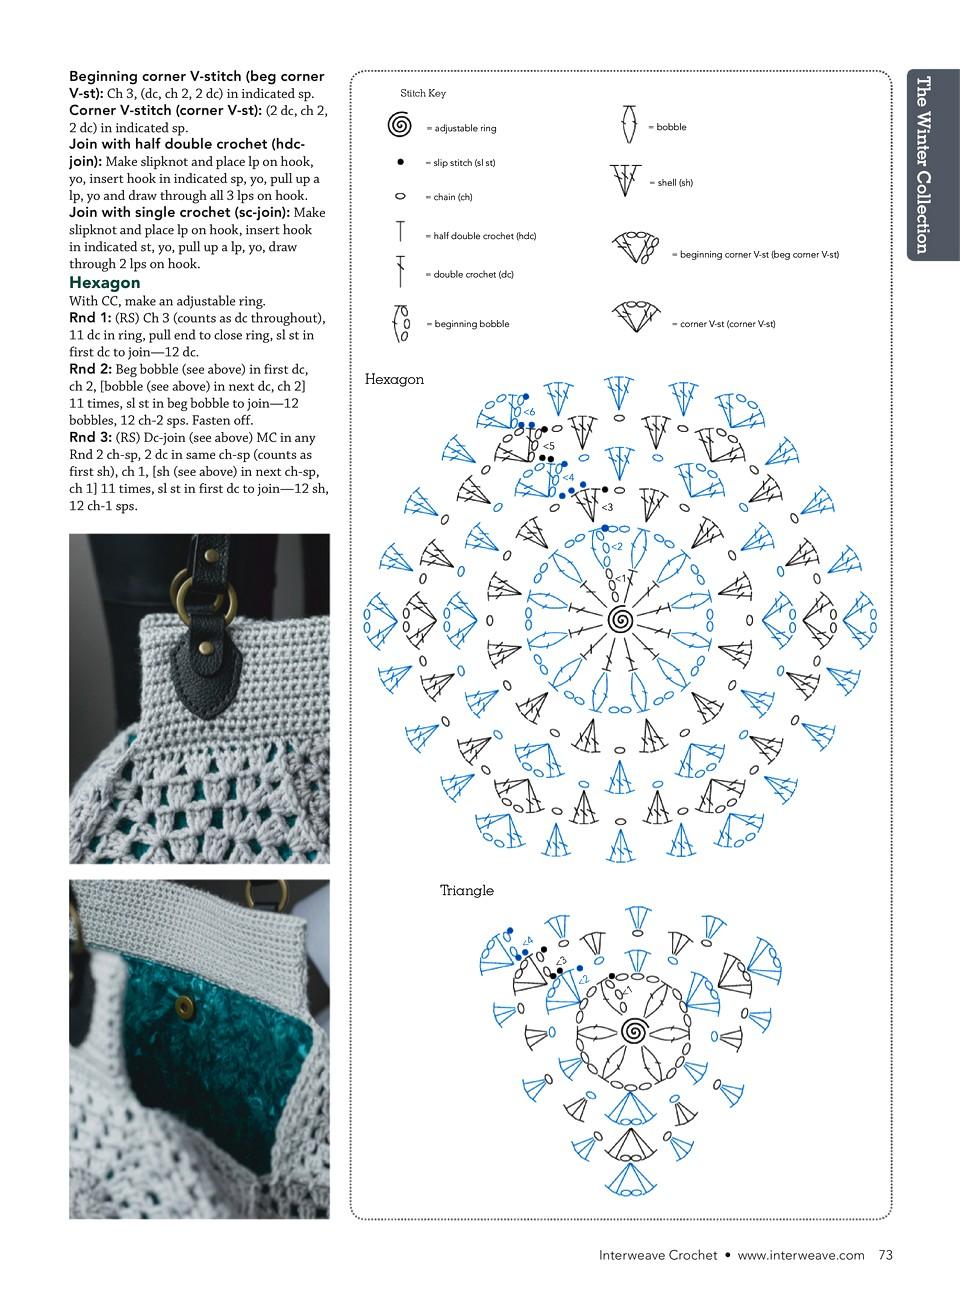 Interweave Crochet Winter 2019-74